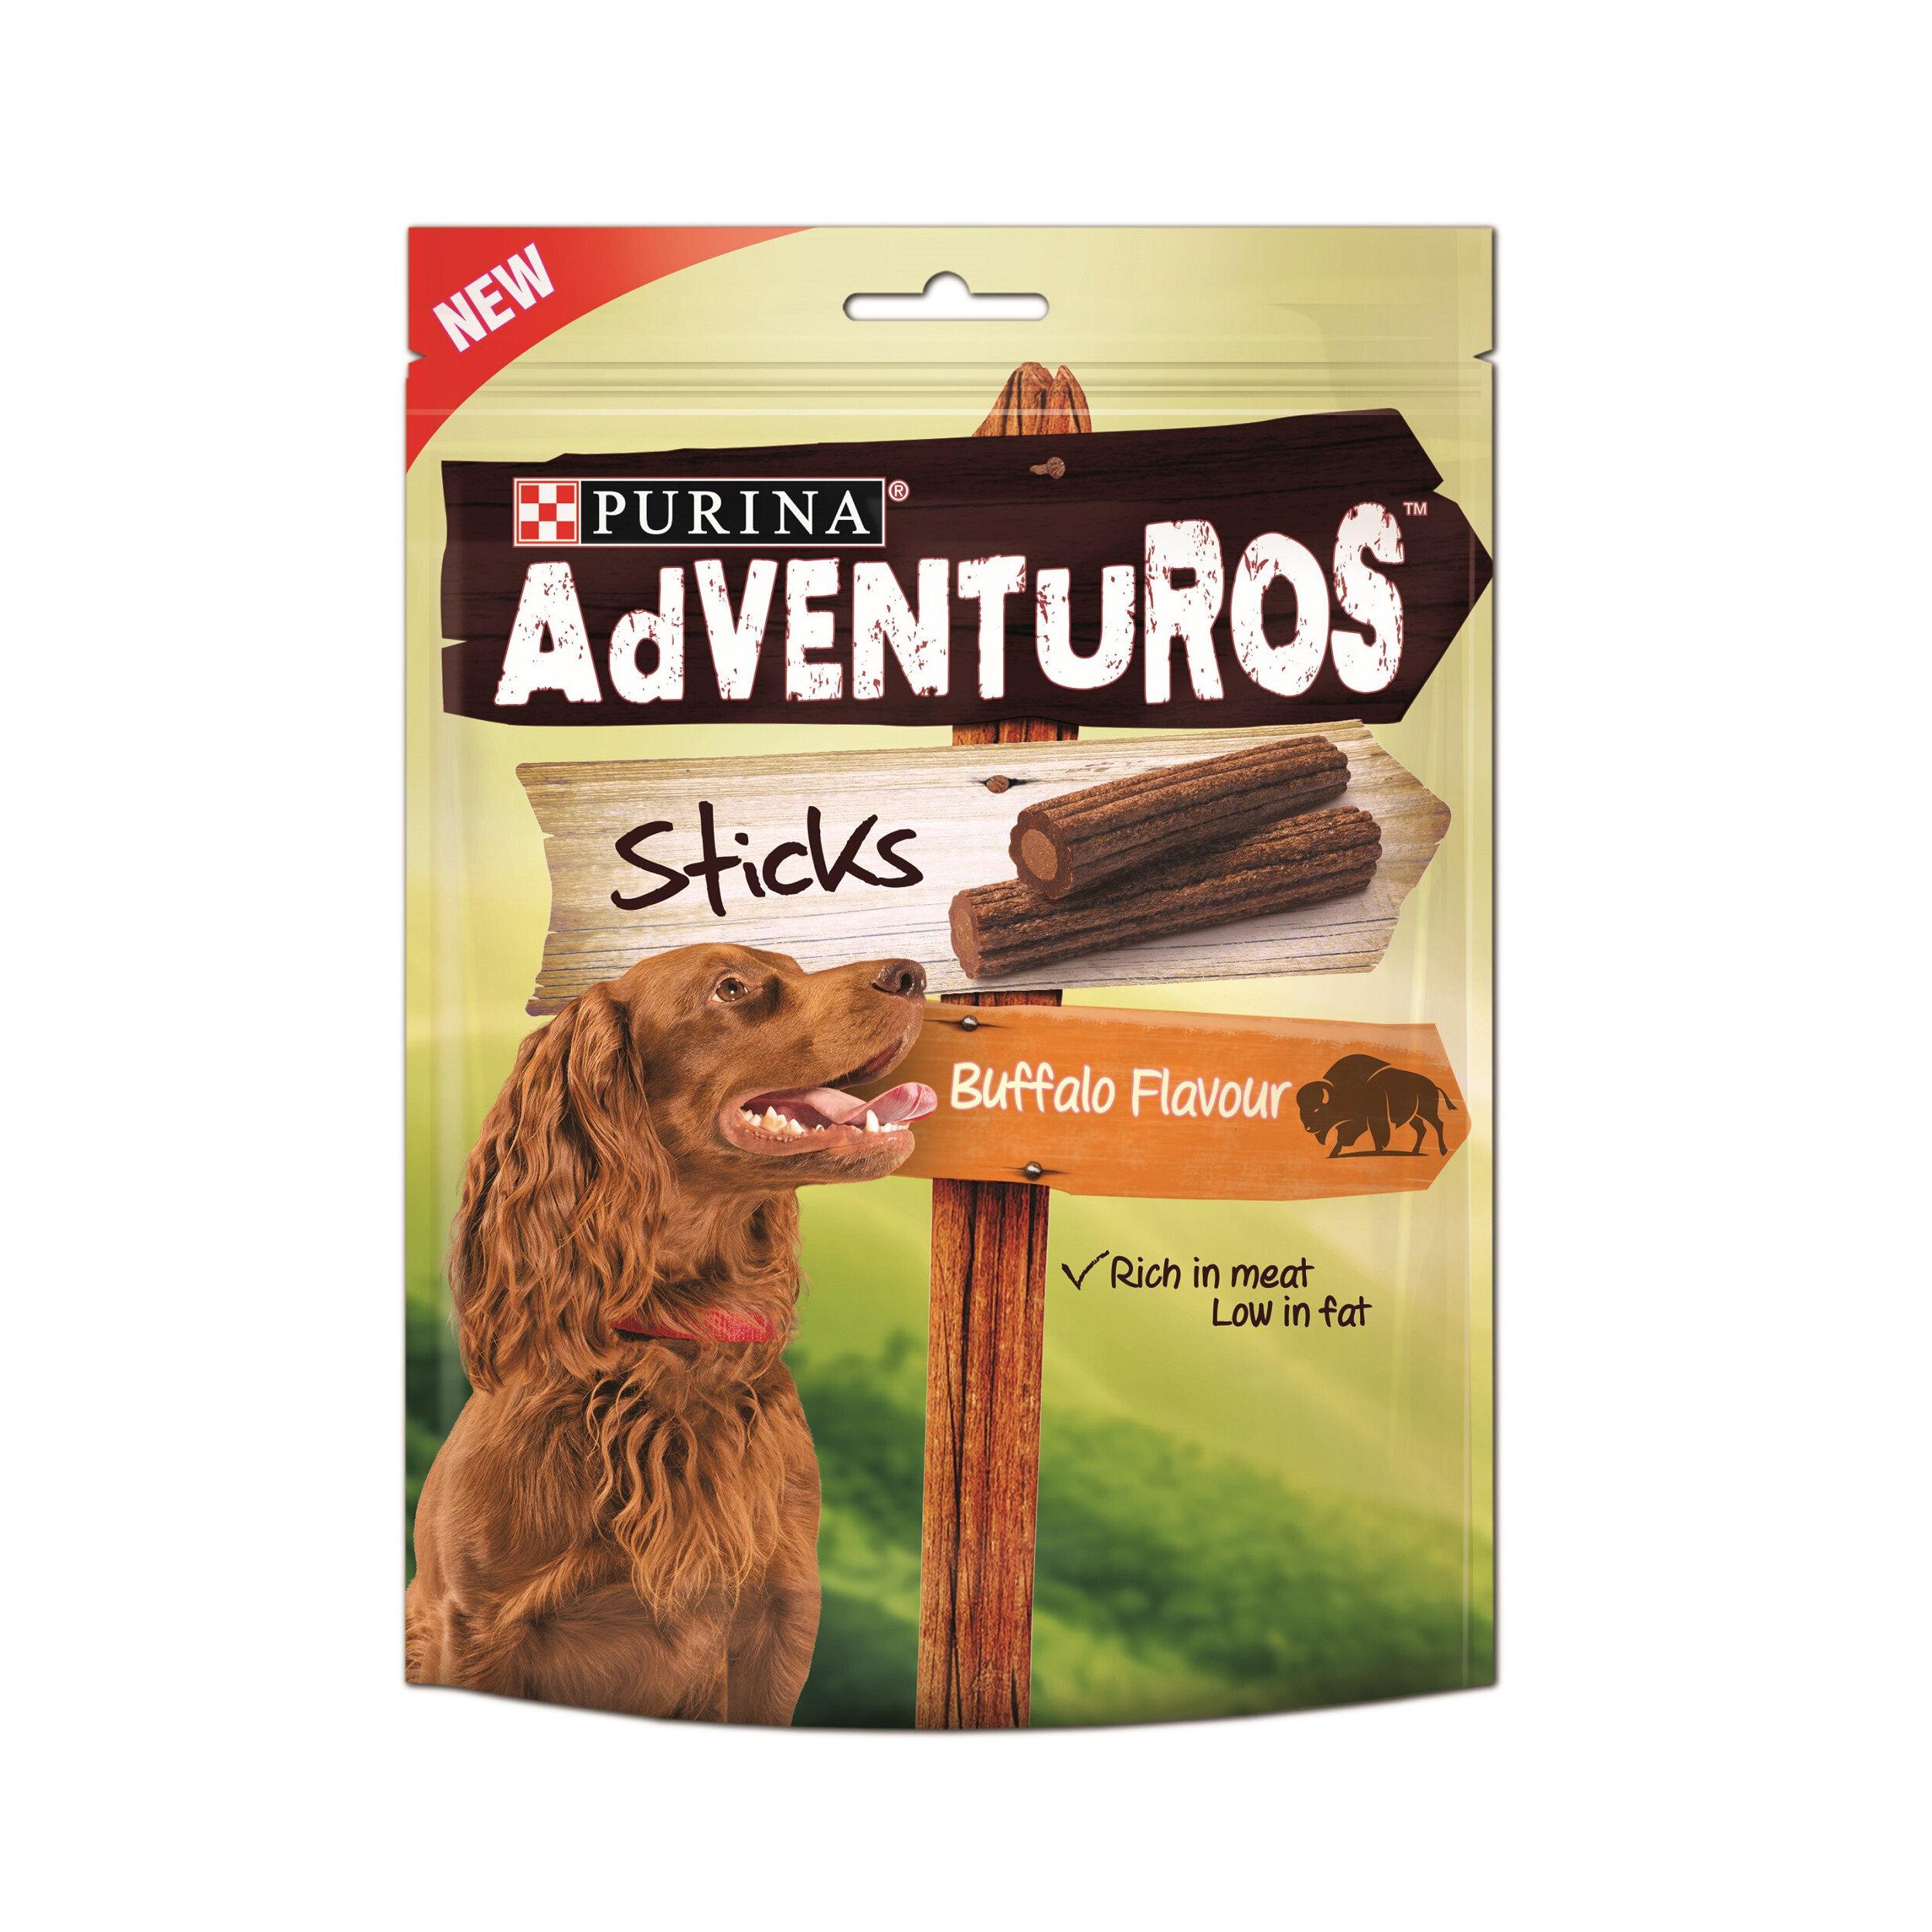 Nestle Purina Adventuros Sticks Dog Treats 6 x 120g